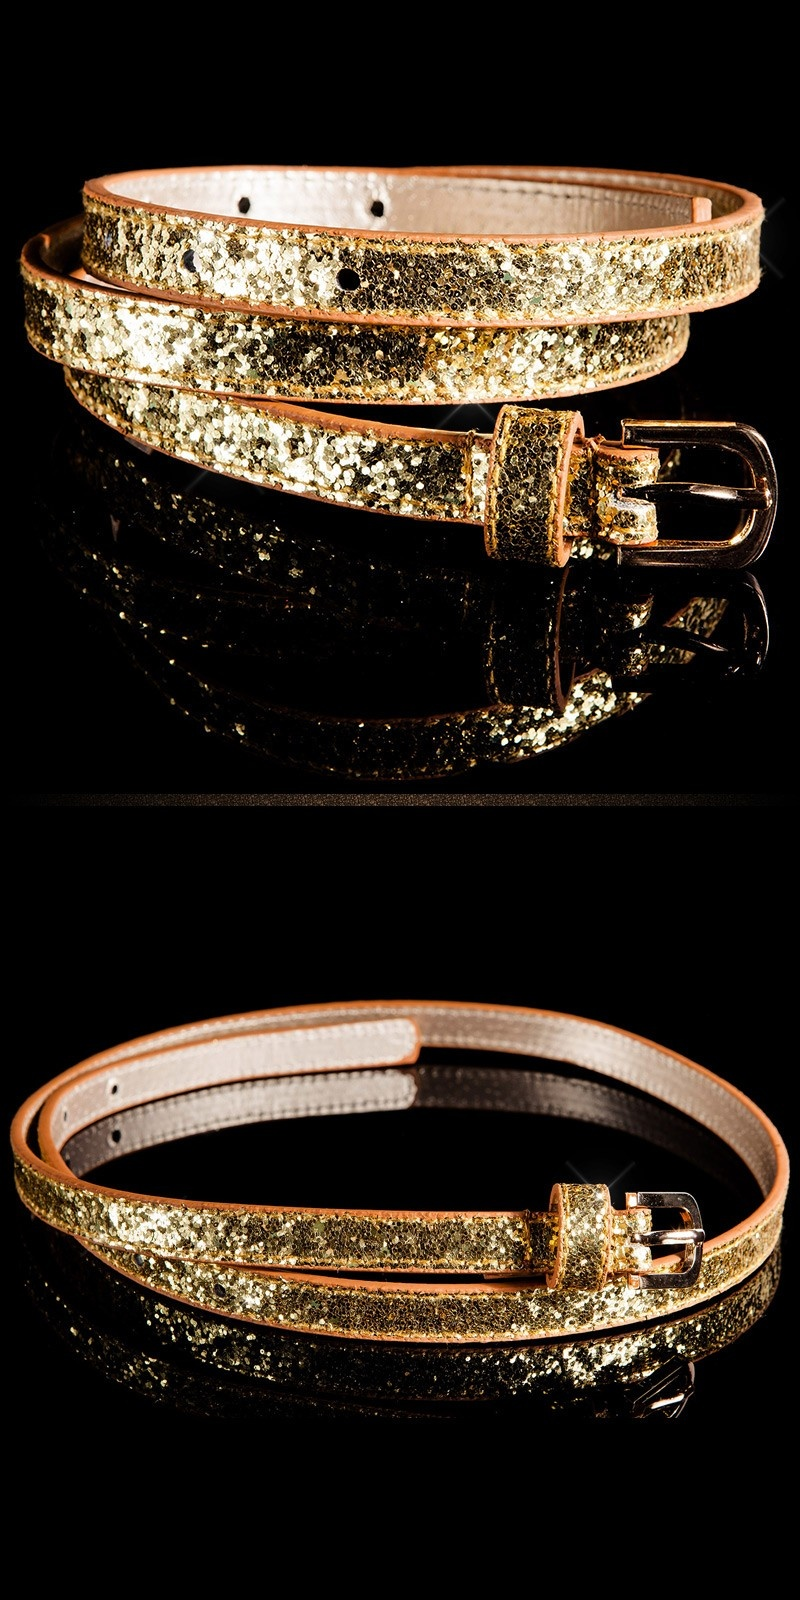 Trendy belt with glitter Gold